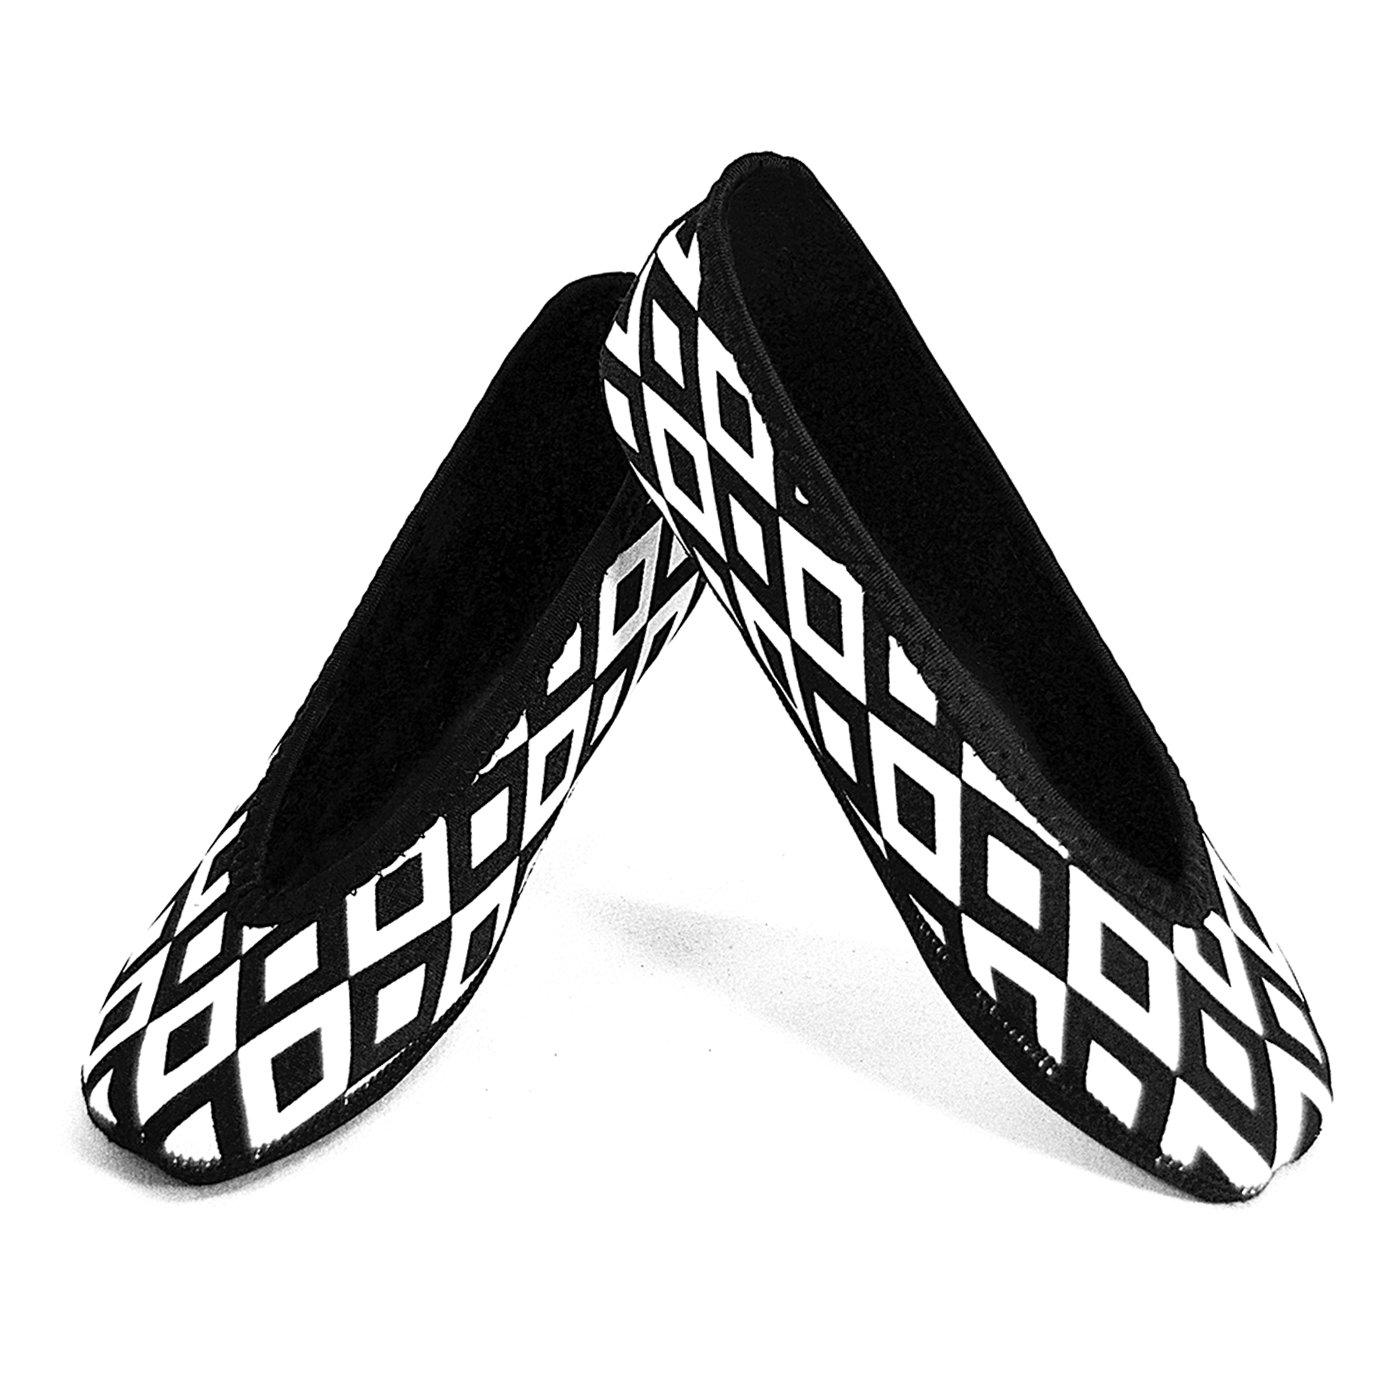 Nufoot Ballet Flats Women's Shoes, Best Foldable & Flexible Flats, Slipper Socks, Travel Slippers & Exercise Shoes, Dance Shoes, Yoga Socks, House Shoes, Indoor Slippers, Black and White Retro, Large